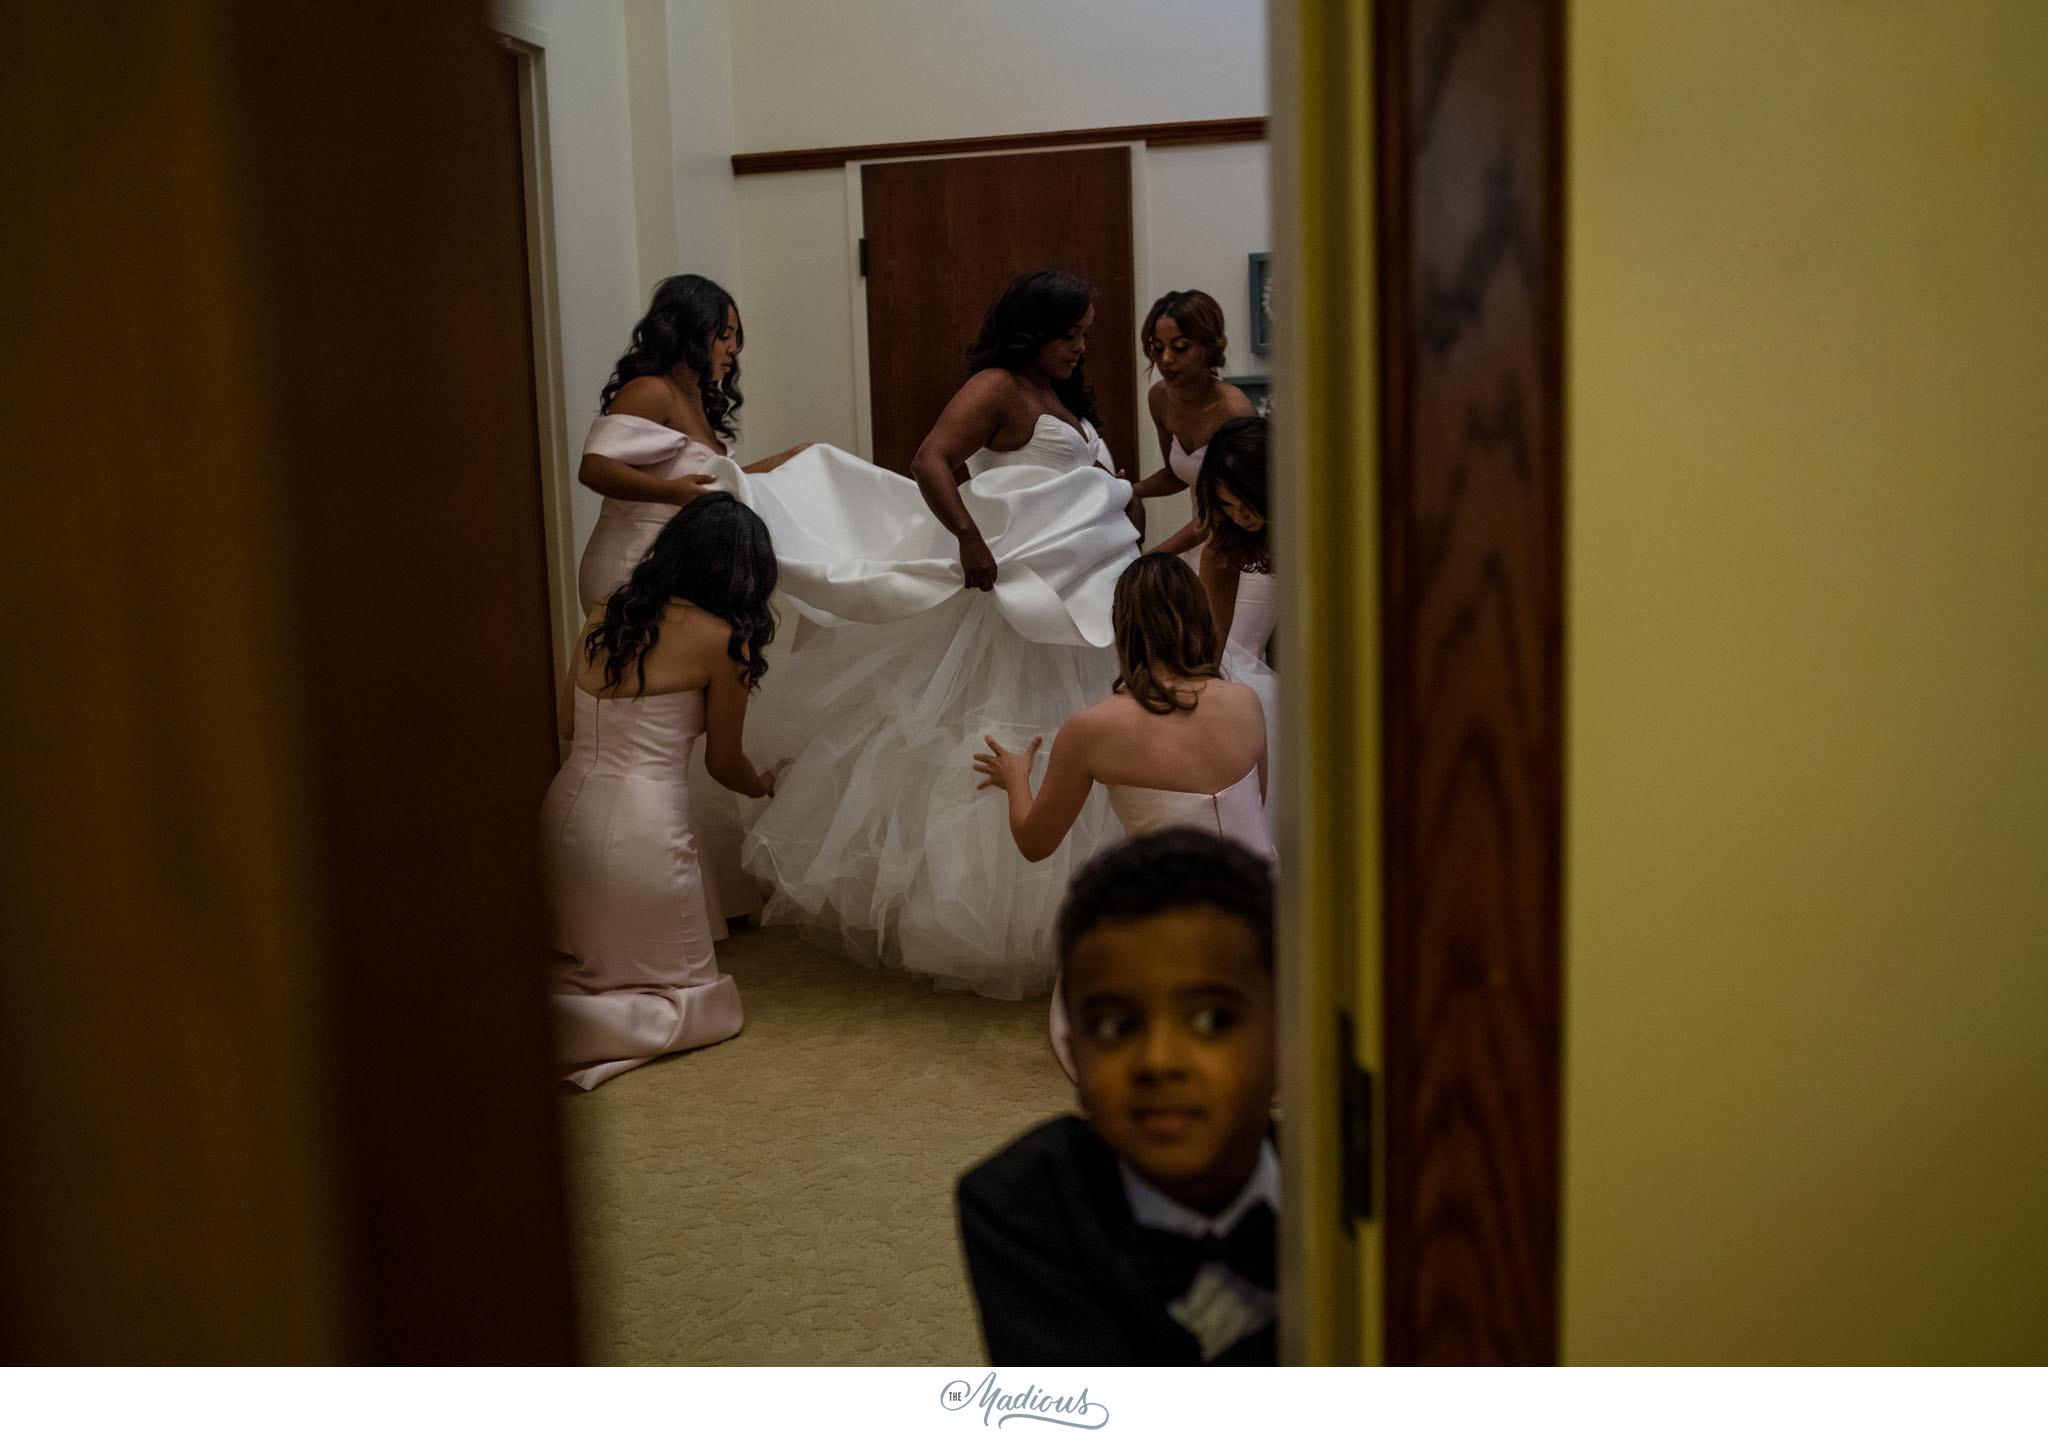 nmwa+wedding,+women+in+the+arts+wedding,+ethiopian+wedding,+dc+wedding+0060.jpg